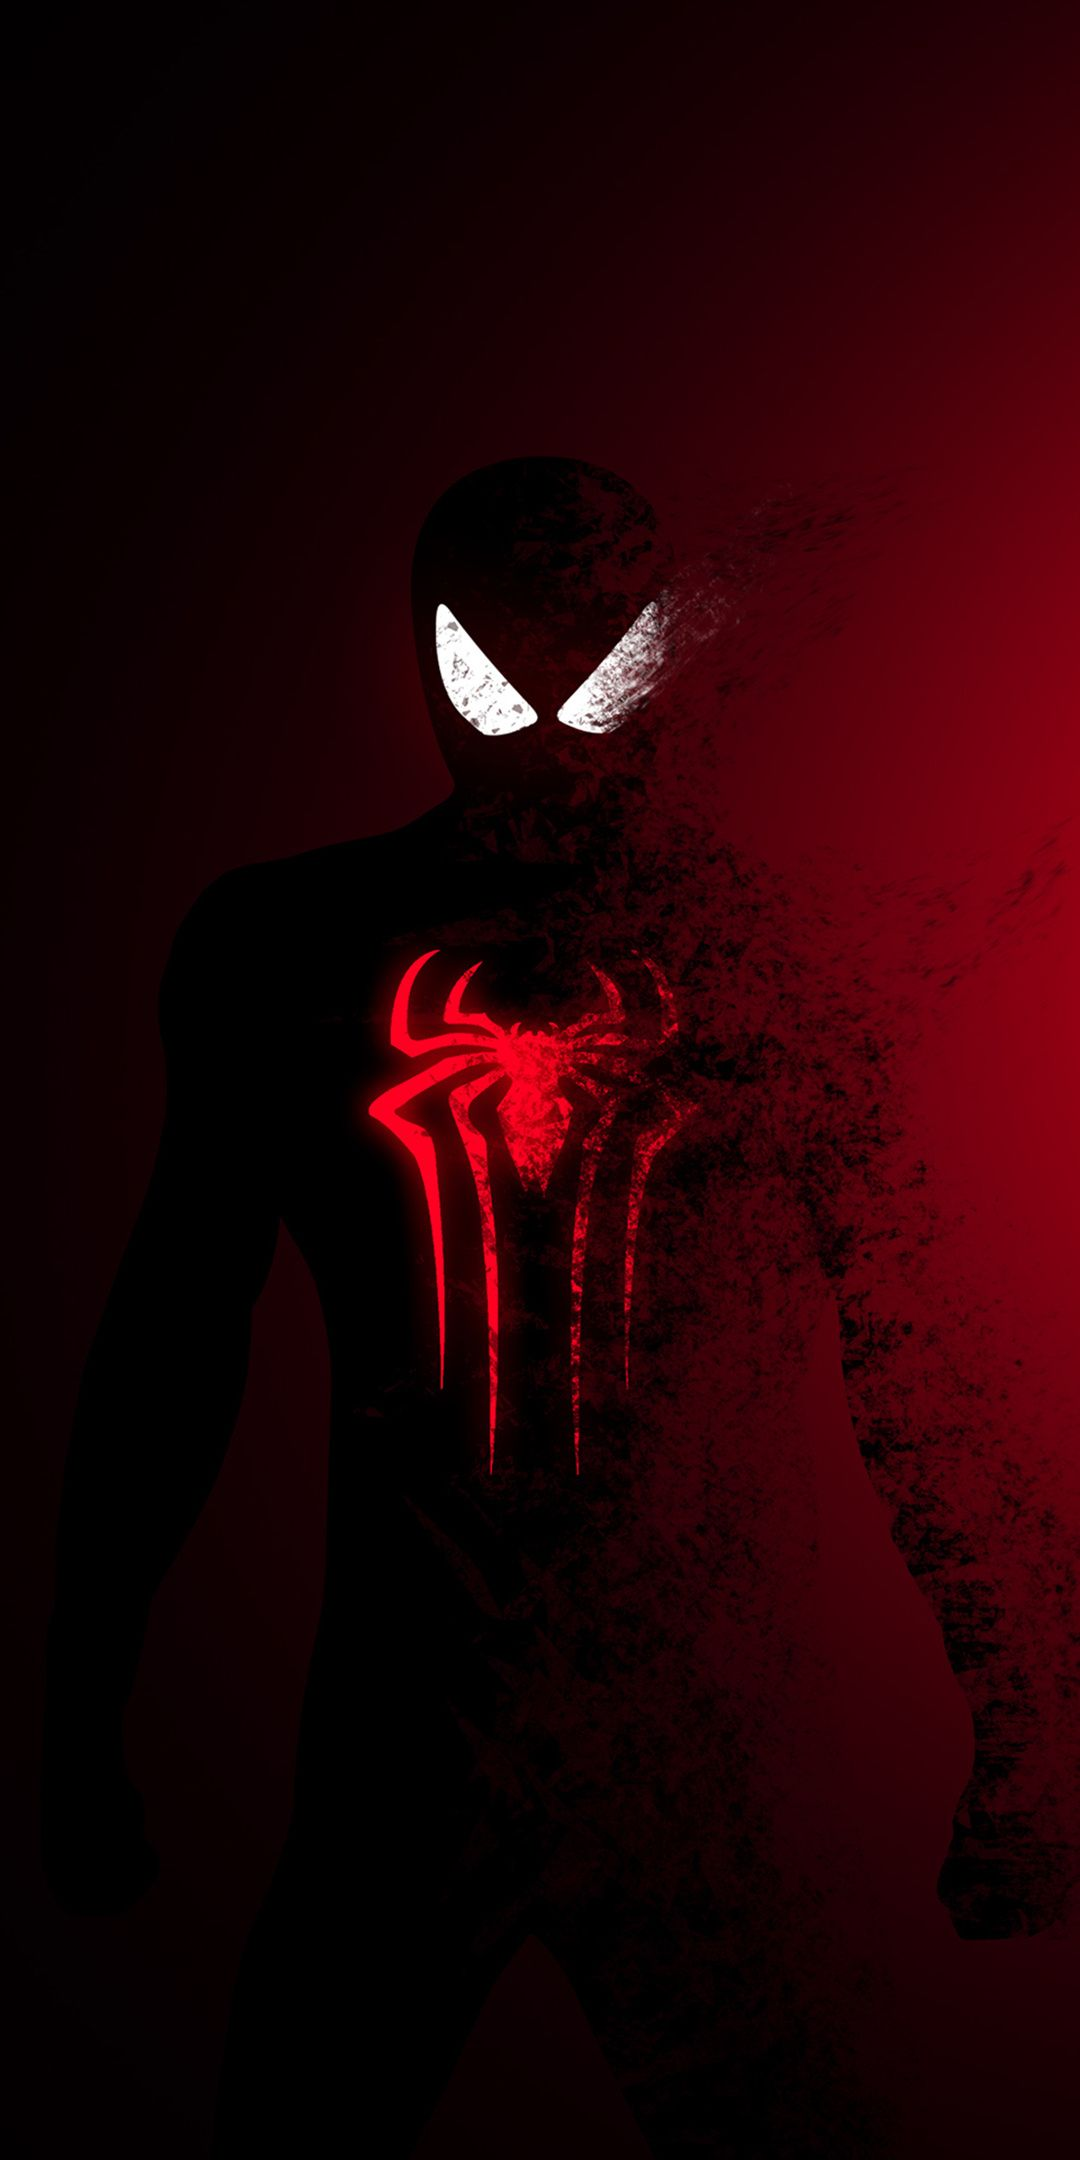 1080x2160 Spiderman, SpiderMan Far From Home, darkred